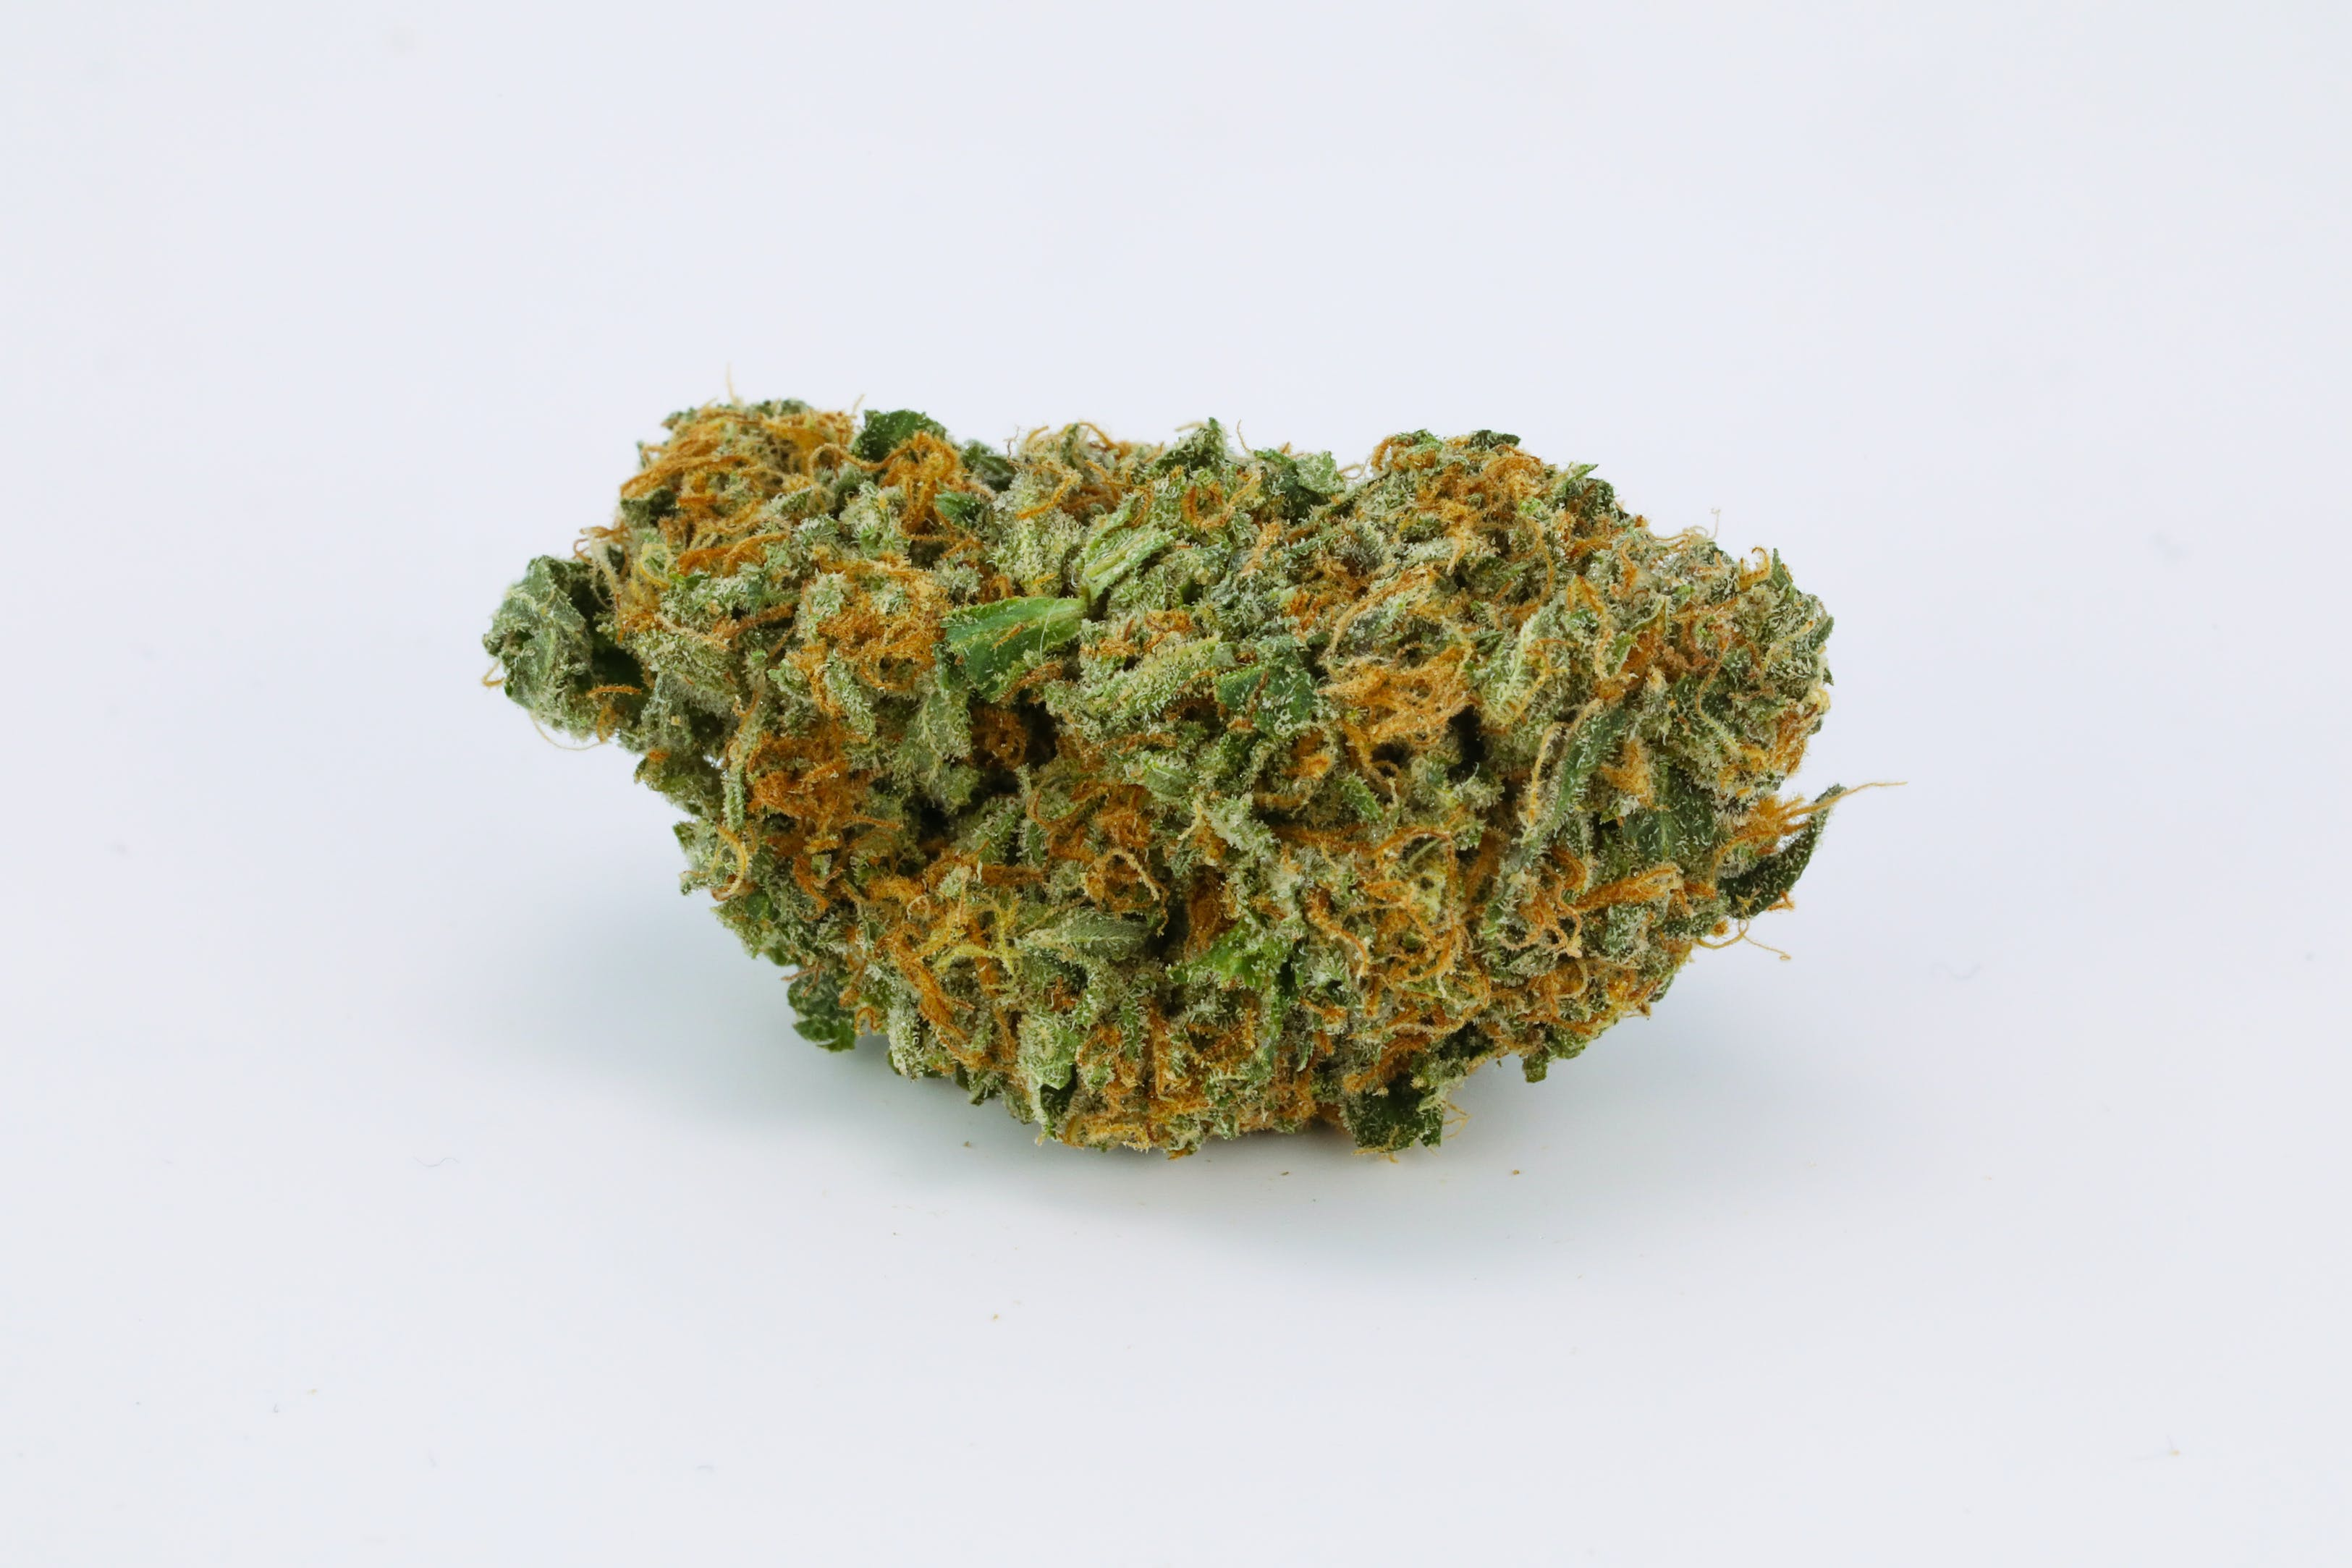 Ogre Kush Weed; Ogre Kush Cannabis Strain; Ogre Kush Indica Marijuana Strain